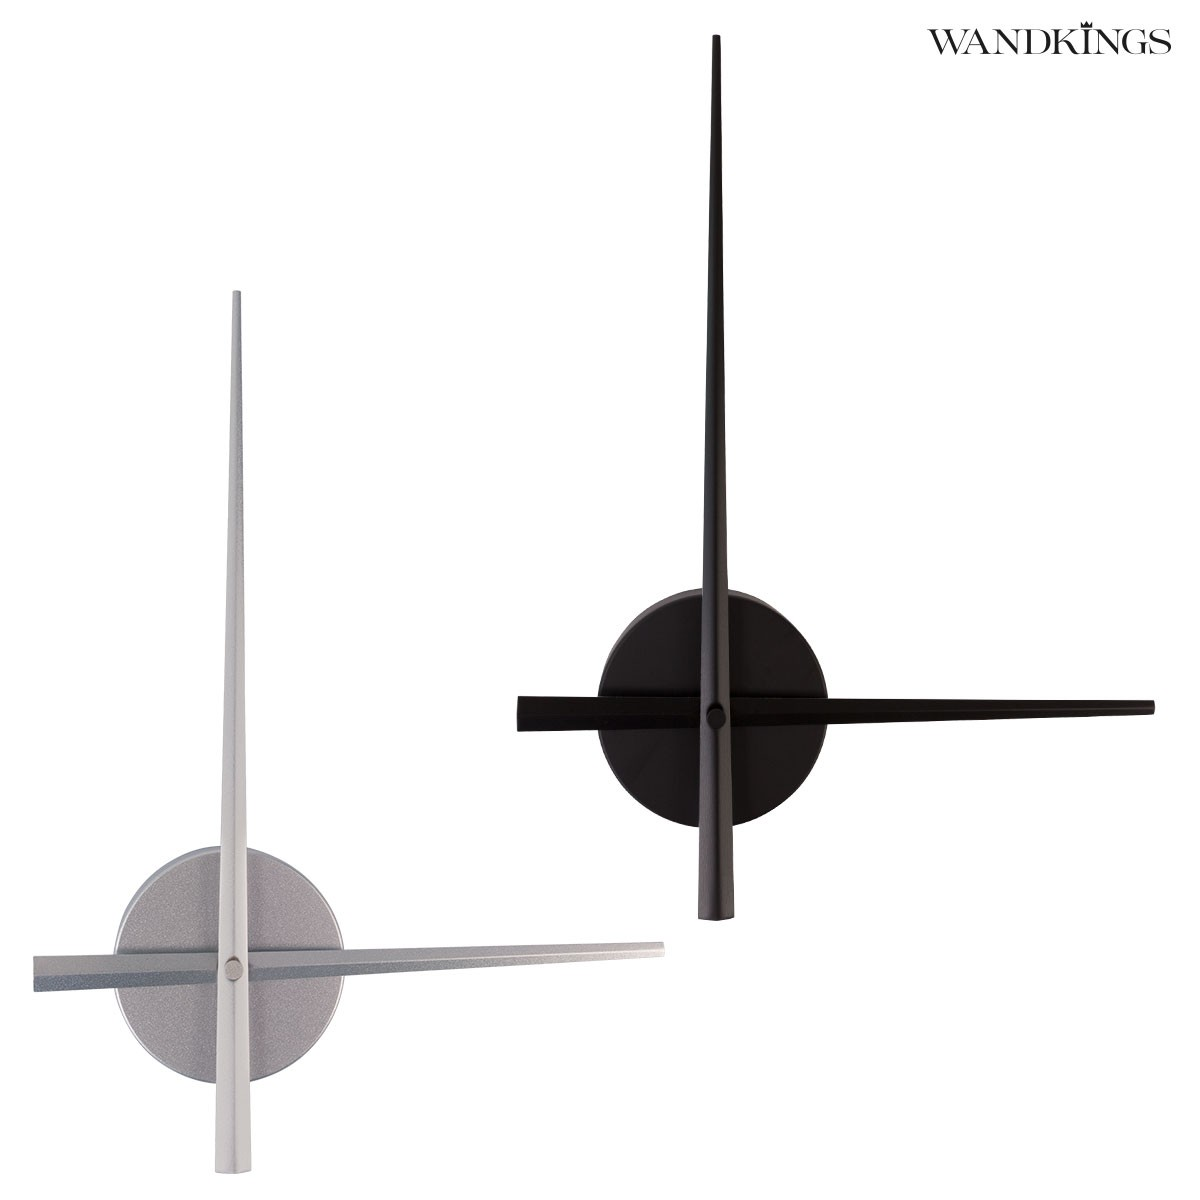 wandtattoo uhr selbst gestalten reuniecollegenoetsele. Black Bedroom Furniture Sets. Home Design Ideas